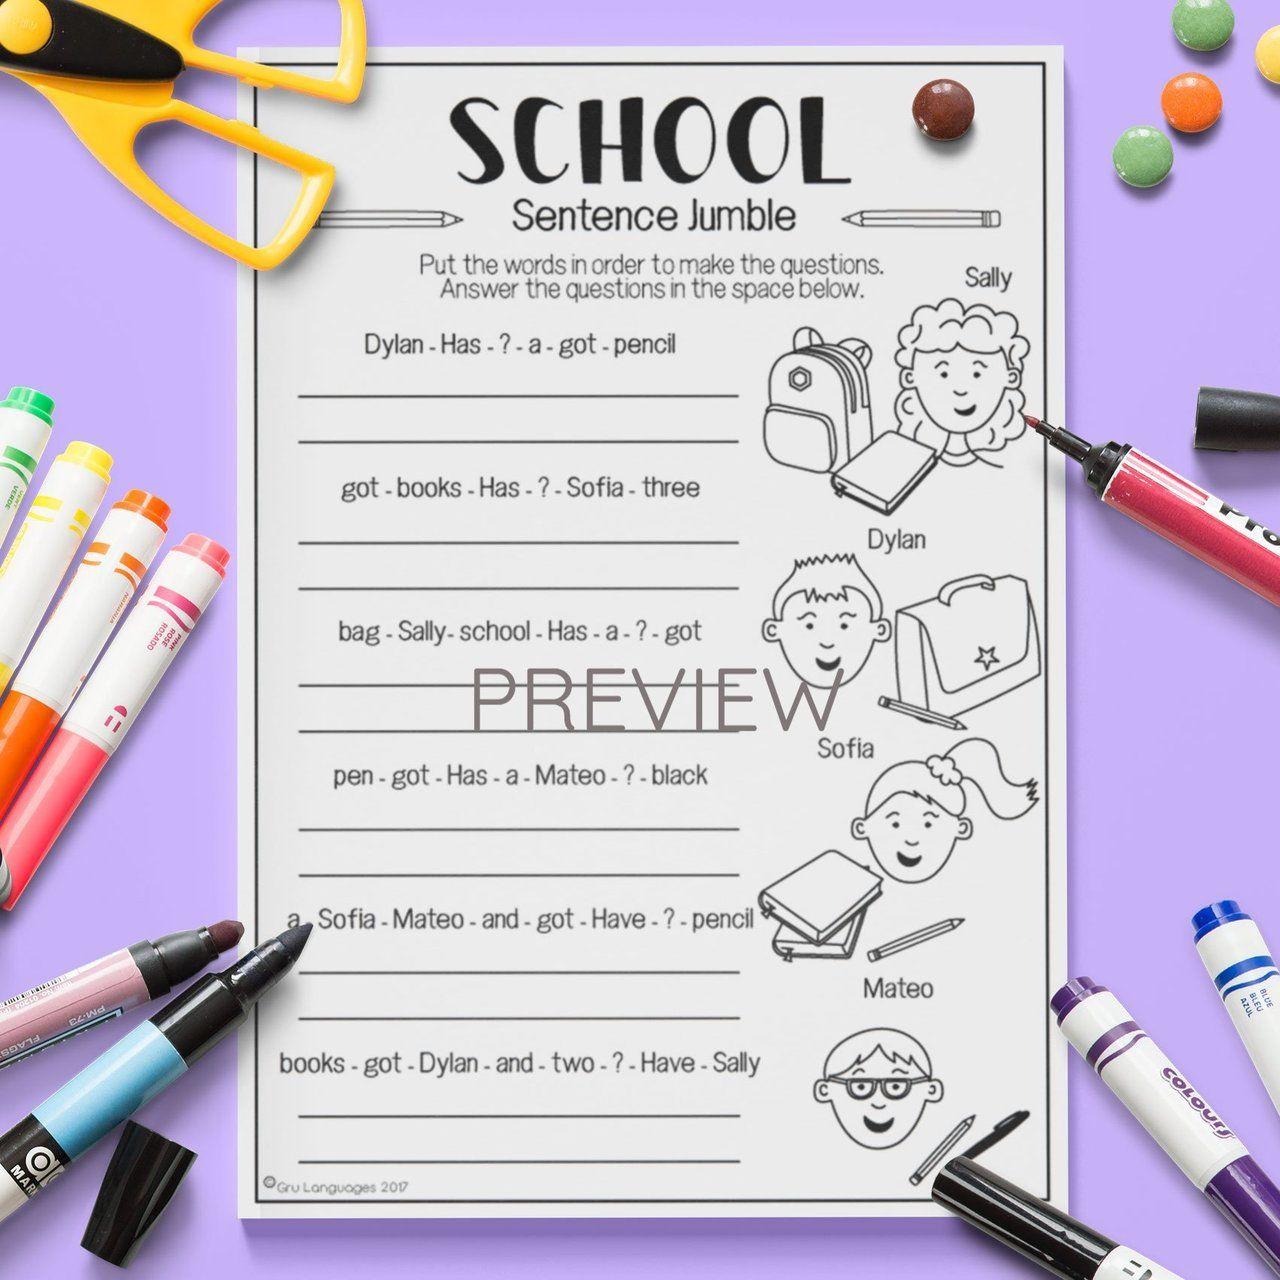 School Sentence Jumble